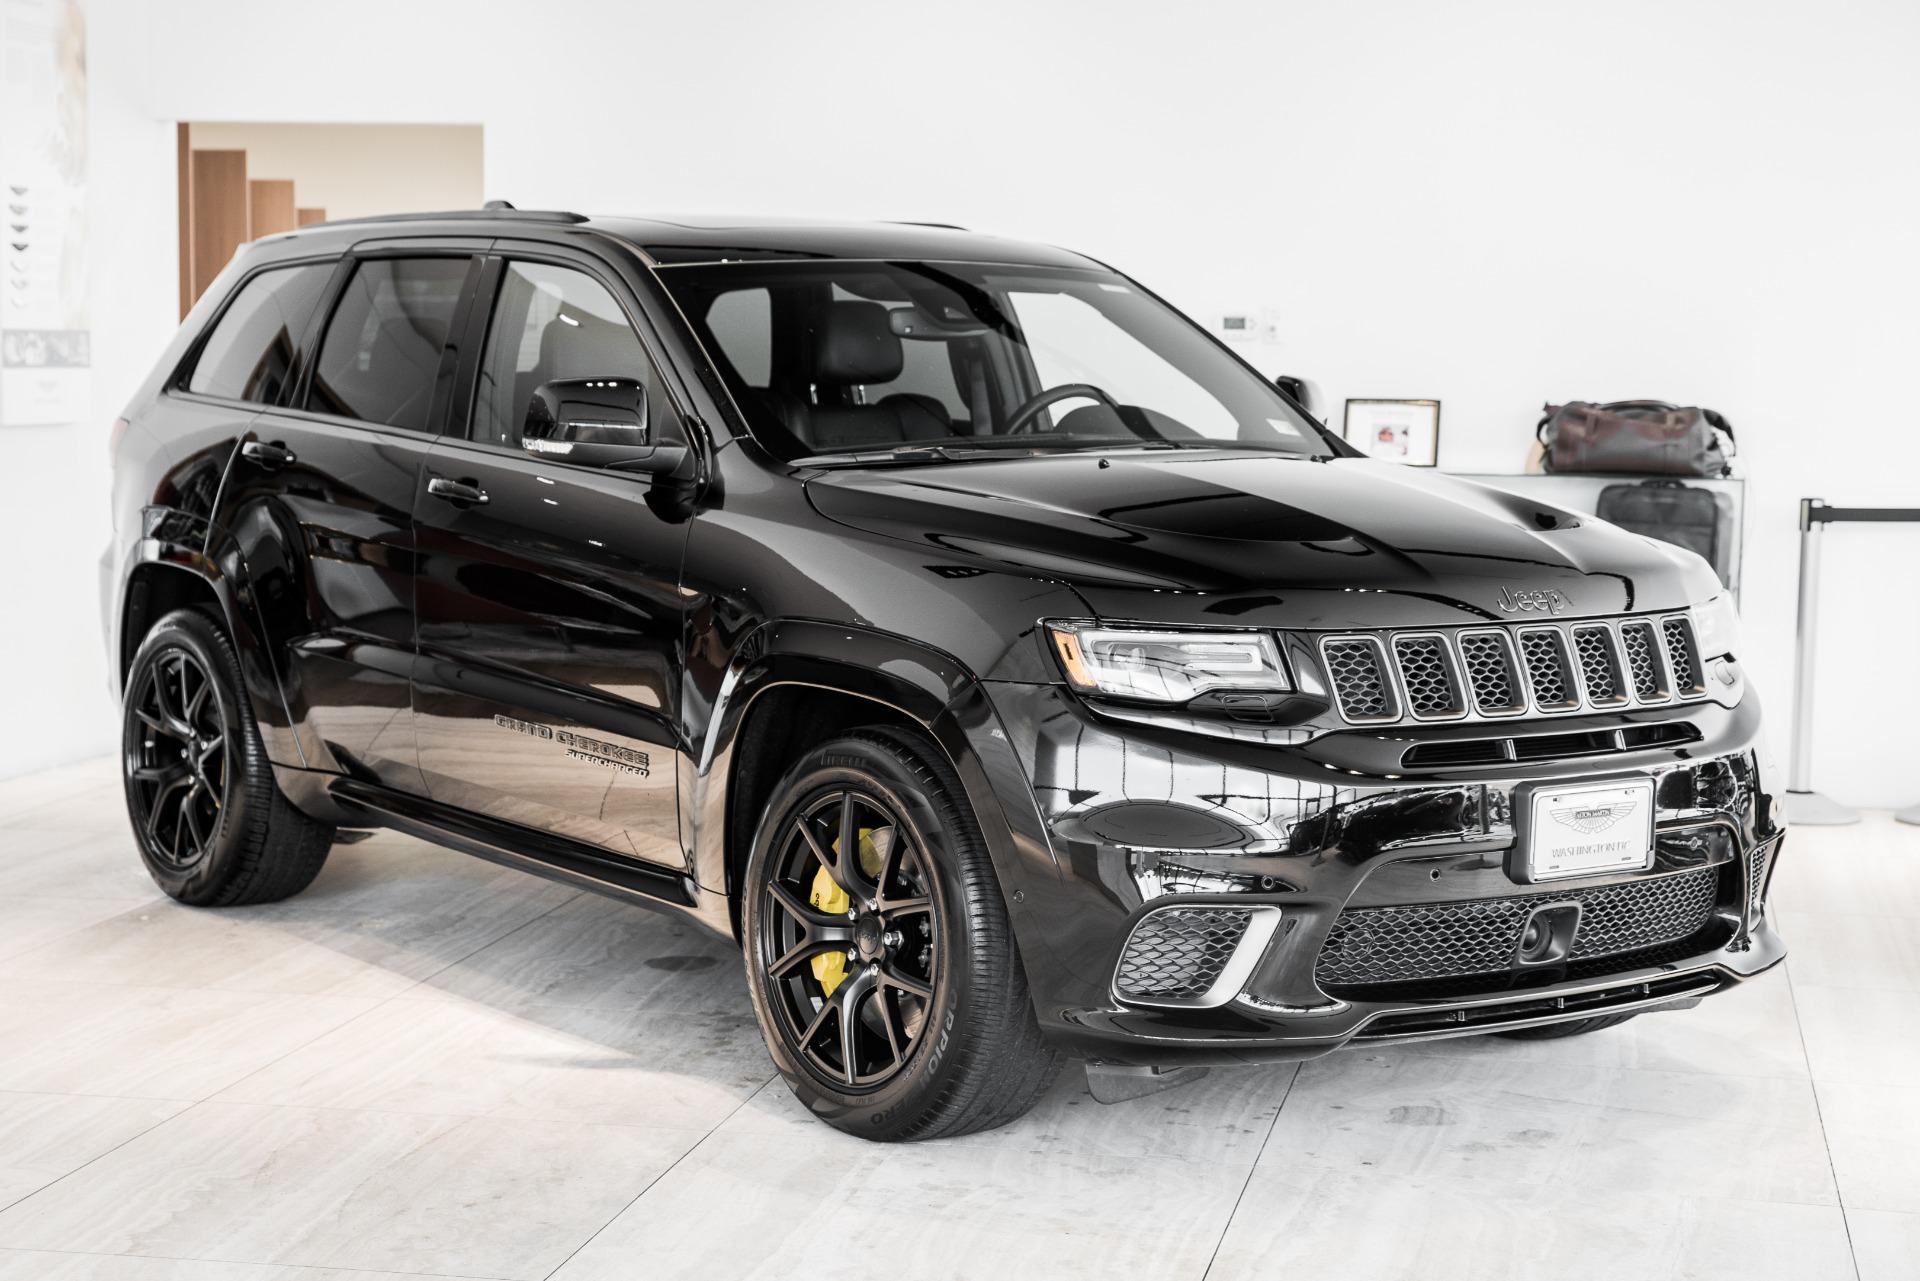 Used-2019-Jeep-Grand-Cherokee-Trackhawk